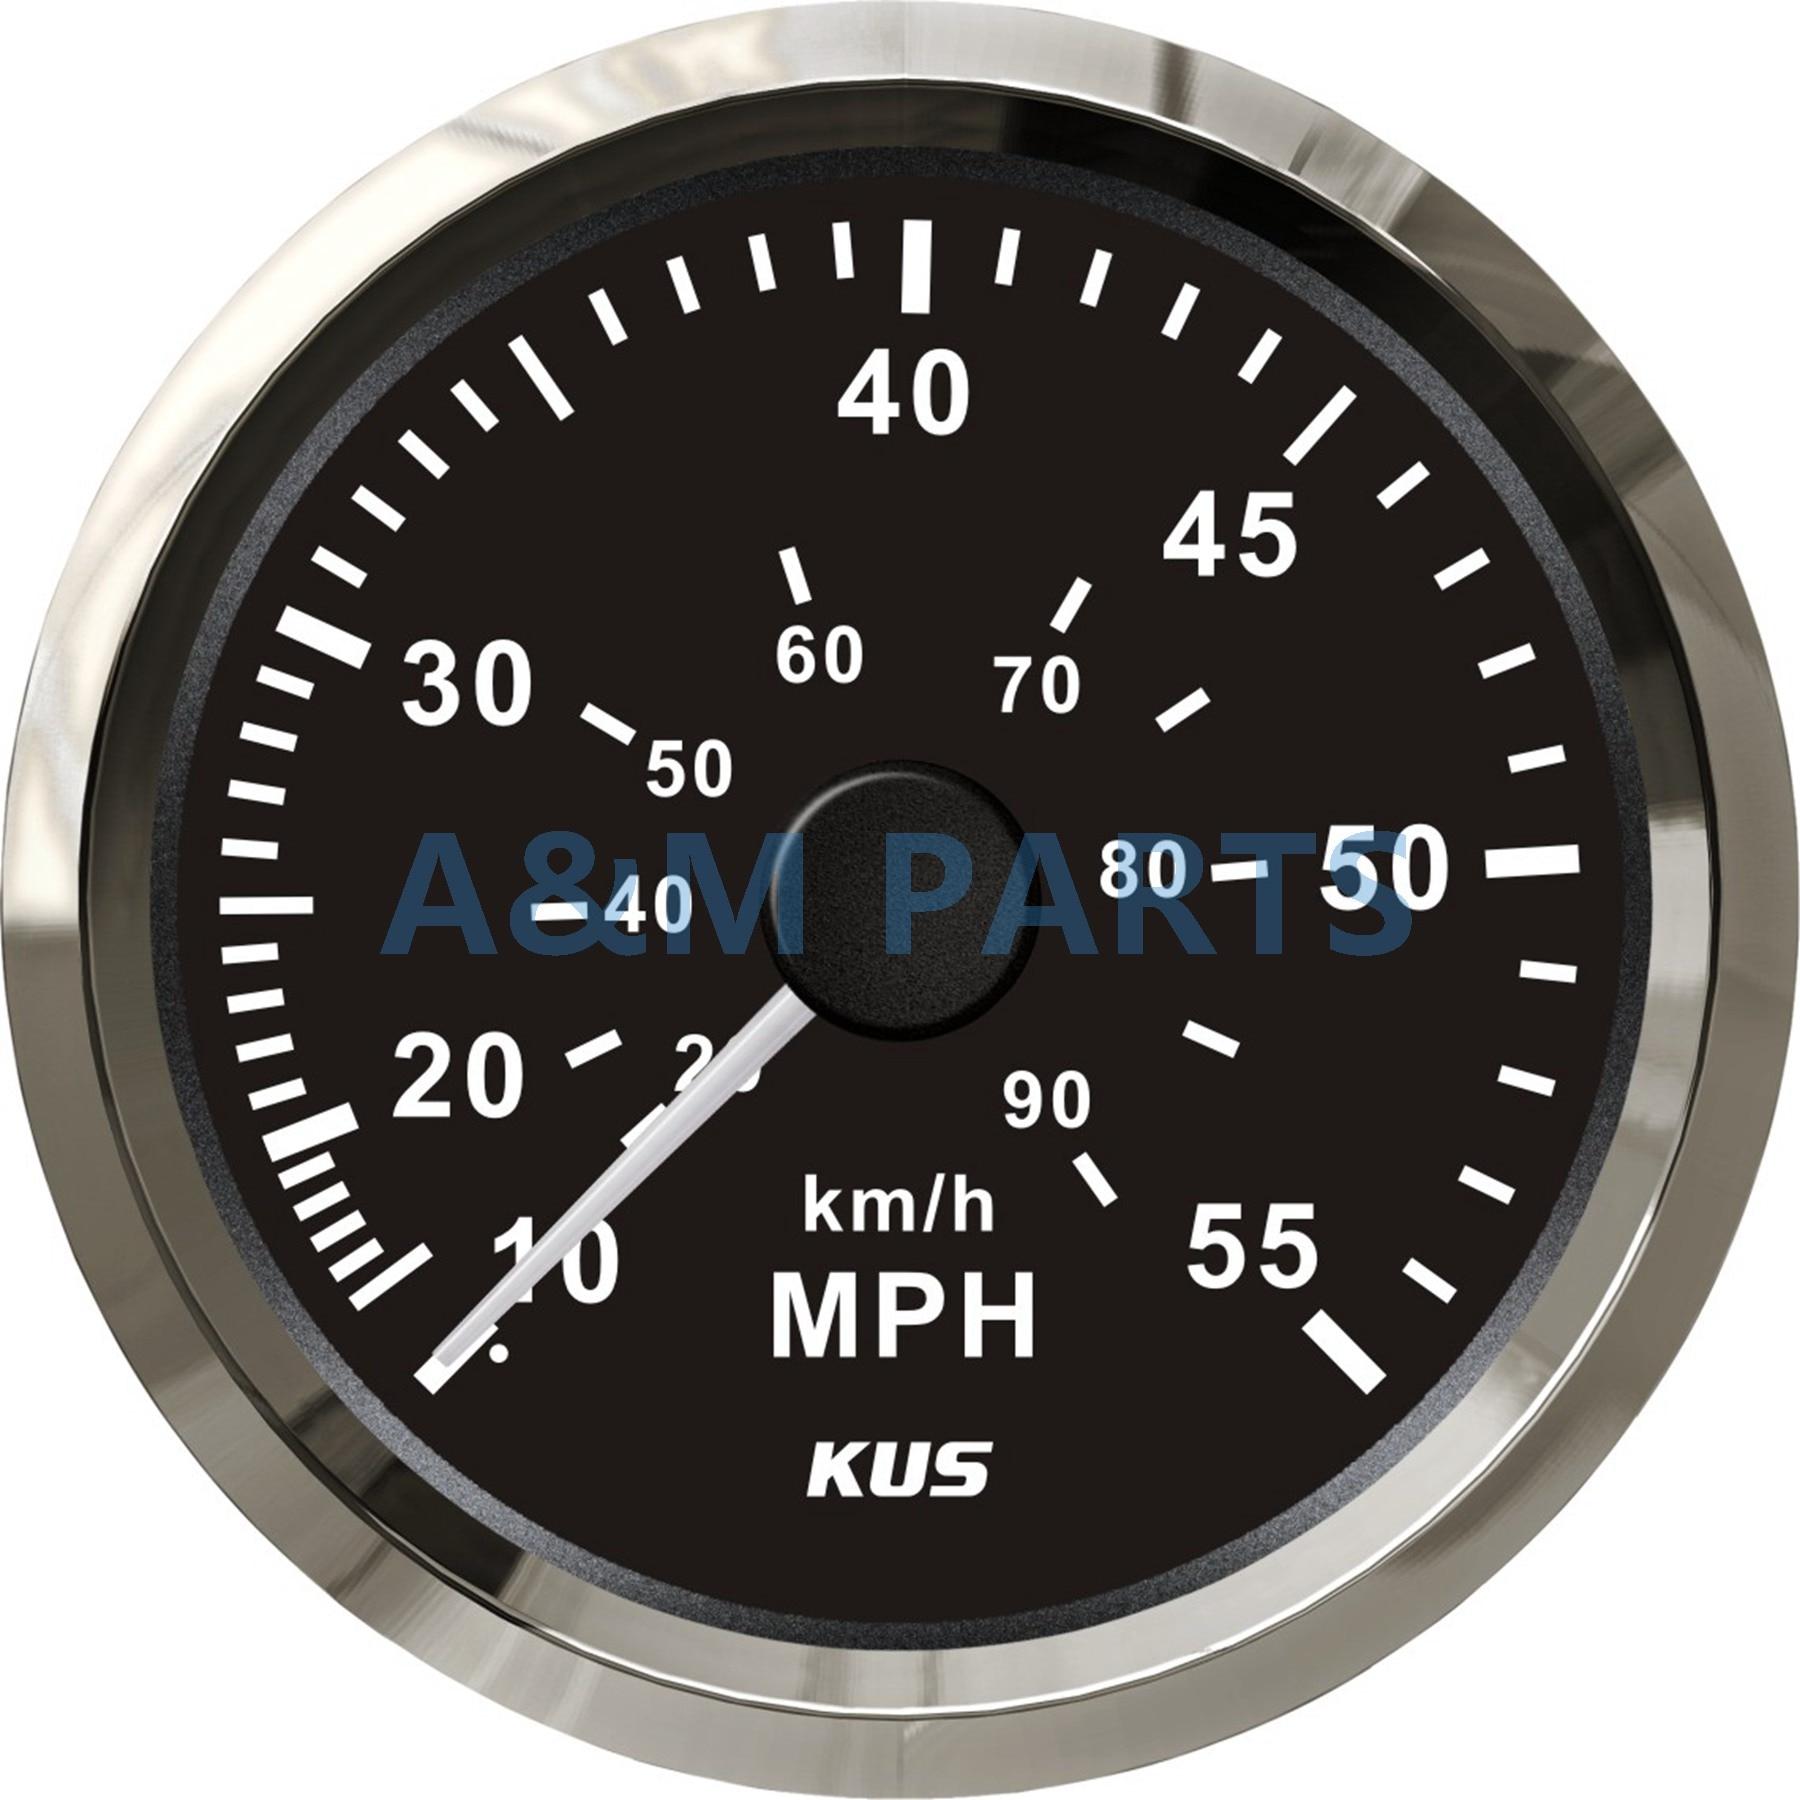 KUS Pressure Signal Speedometer Boat Marine Speedo Gauge Black Face 12/24V 0-55 MPH 85mm цена